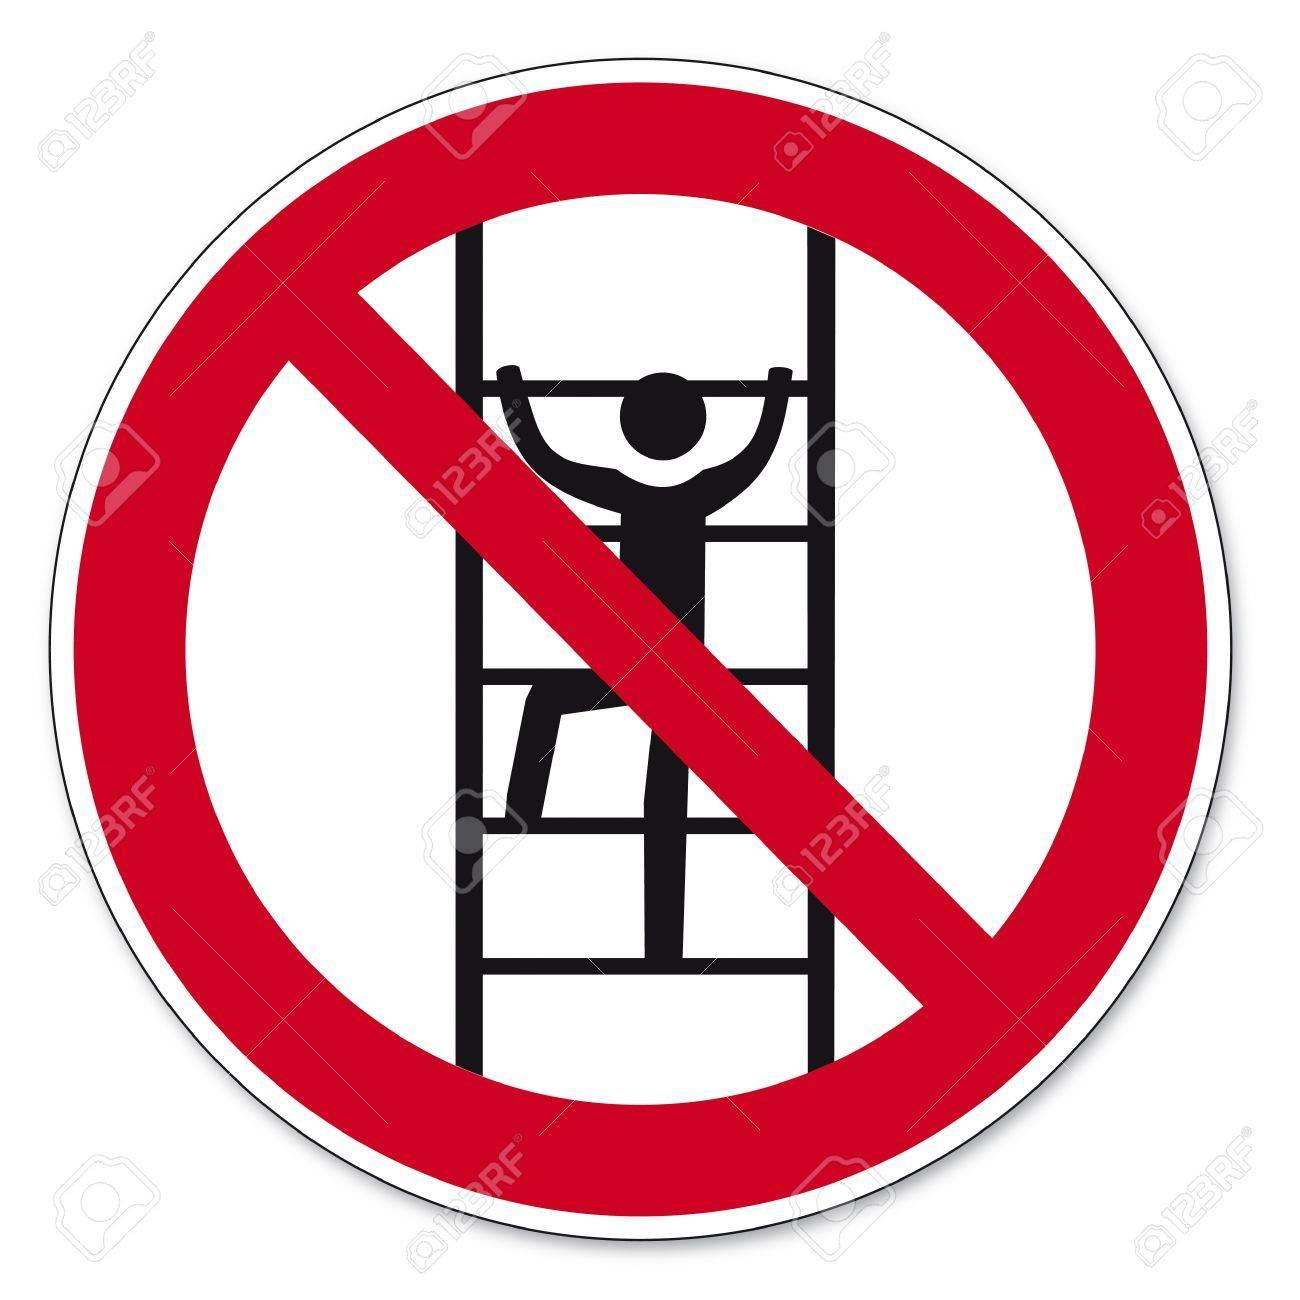 Prohibition signs BGV icon pictogram Climb for unauthorized Stock Vector - 14516821